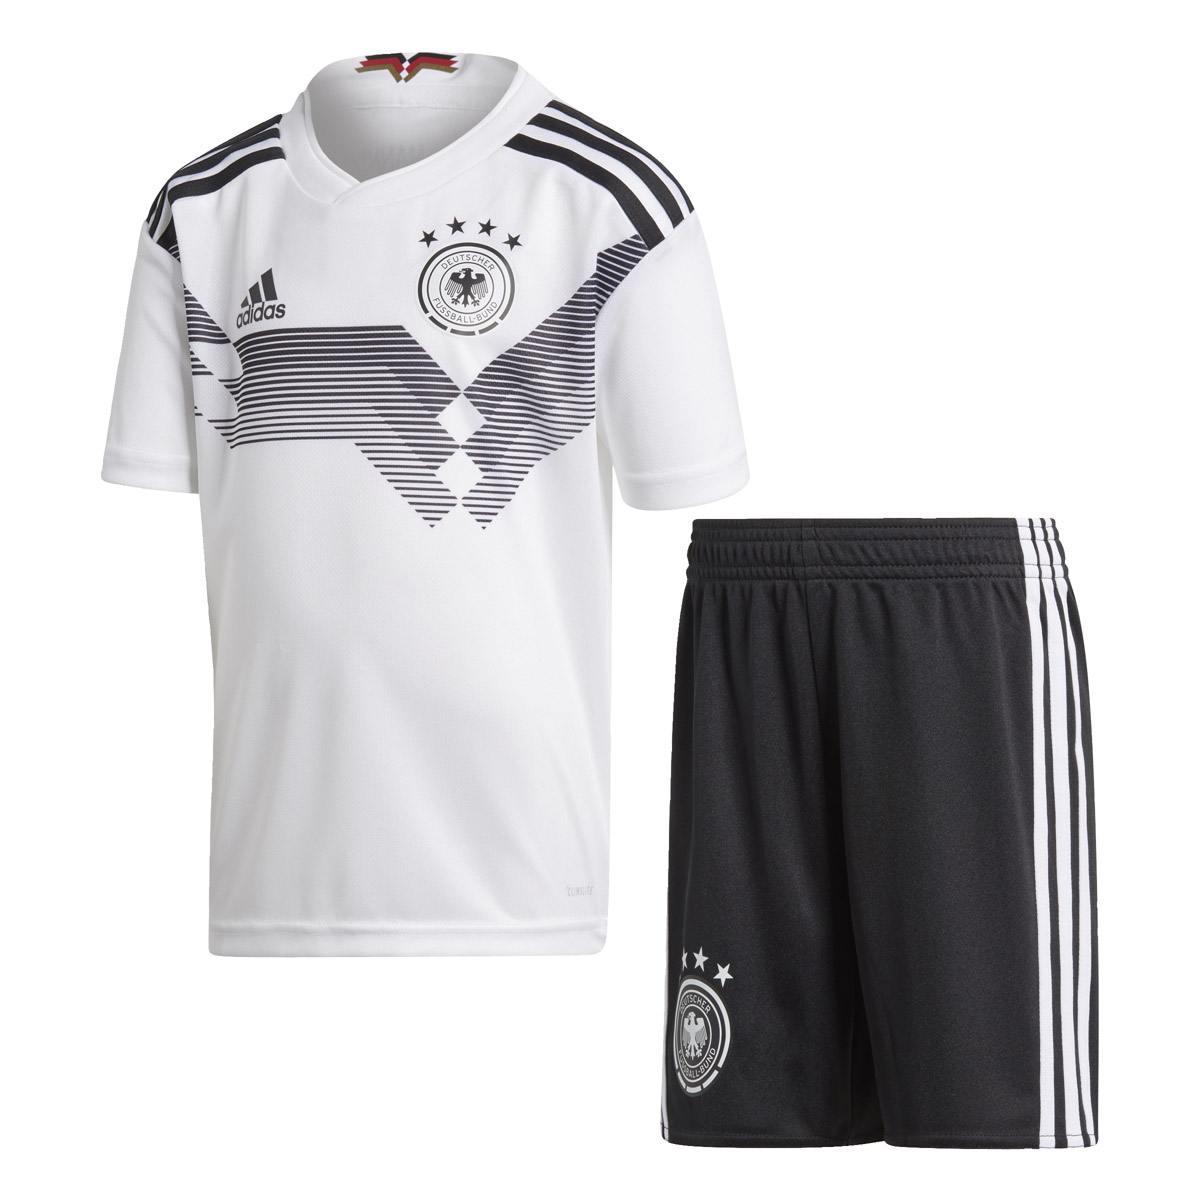 adidas DFB Mini Kit Set (Größe 116, white black)